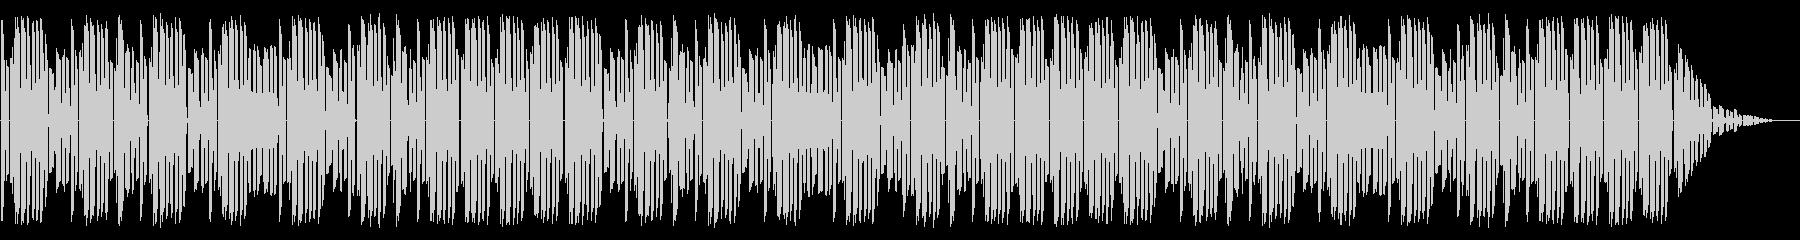 NES STG B02-1(ステージ) の未再生の波形